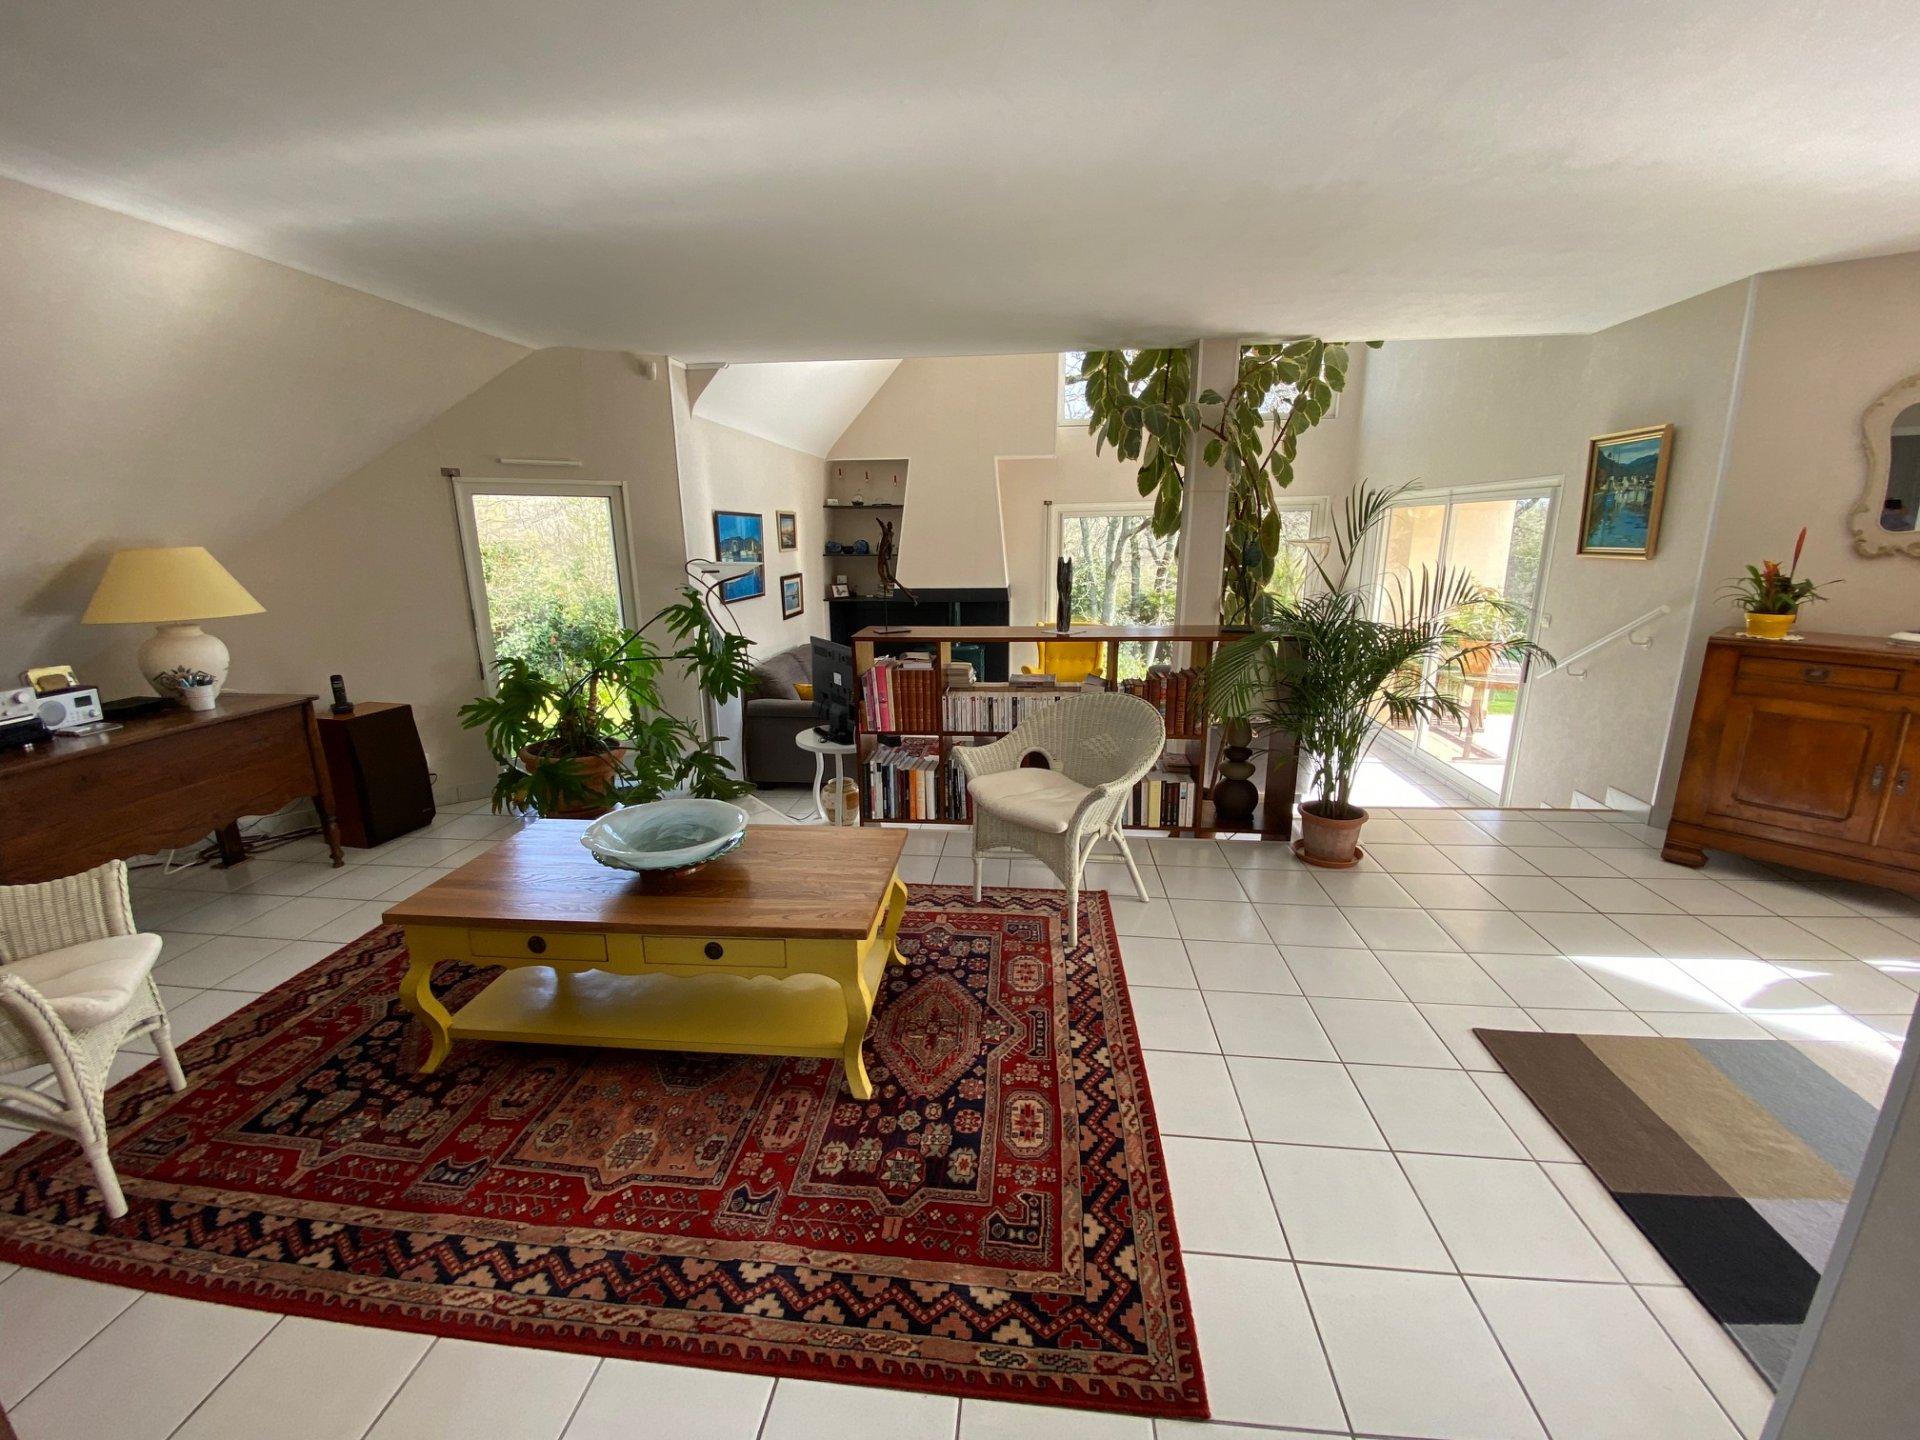 PROPRIETE LUMINEUSE MER et CAMPAGNE 3250 m2 de jardin 4 chambres 1 bureau